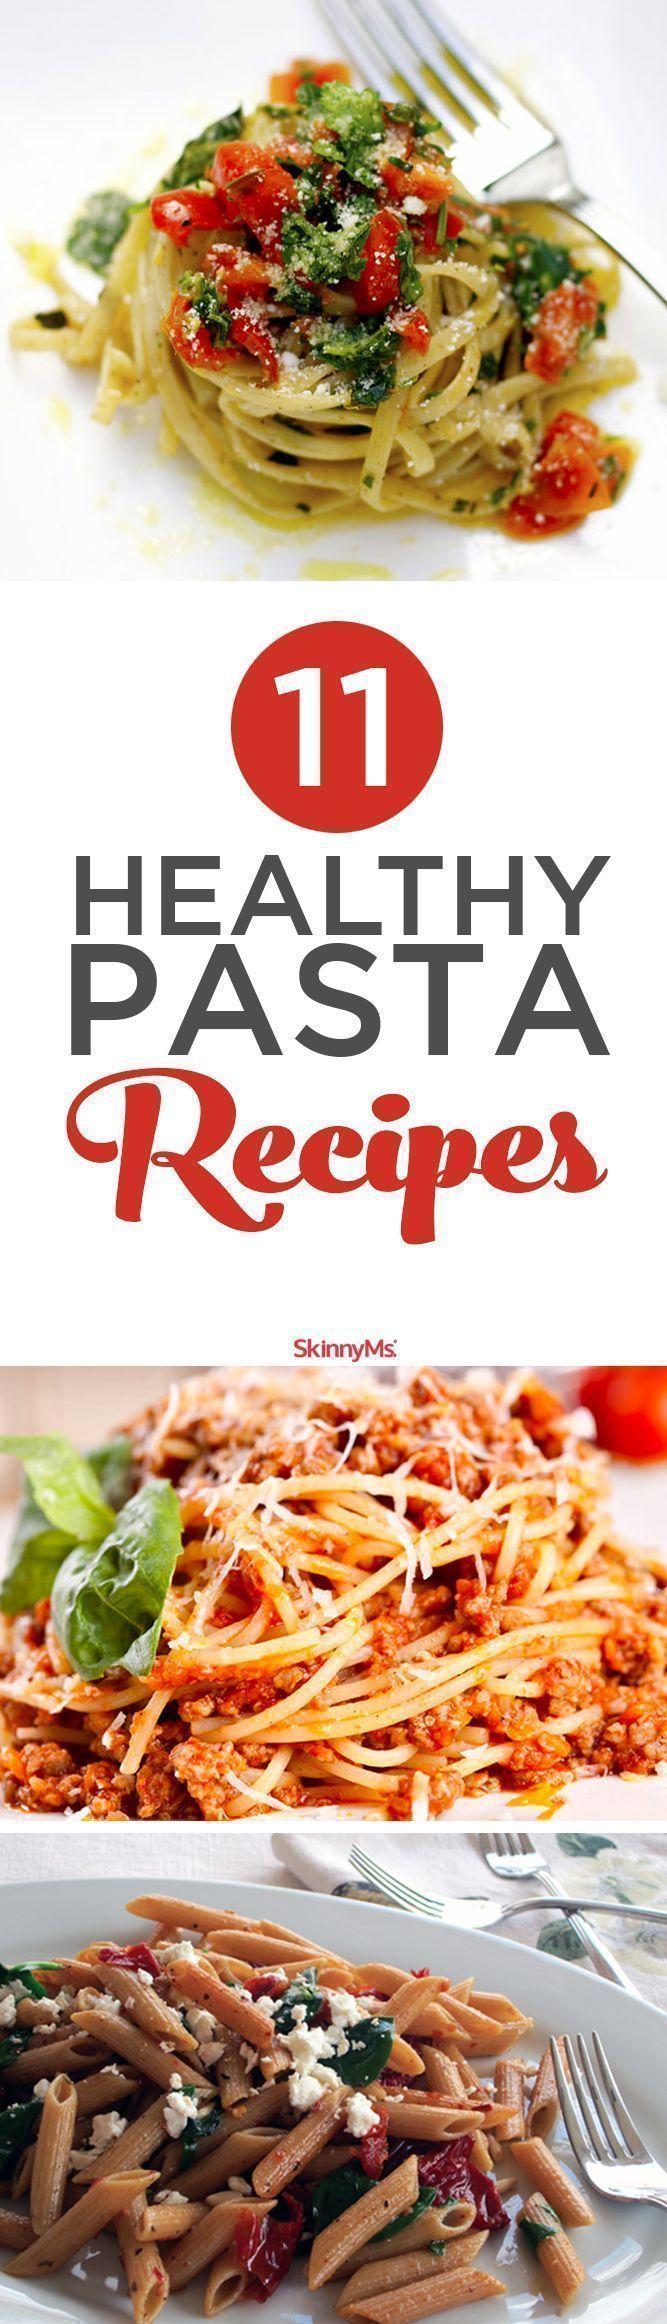 11 Healthy Pasta Recipes